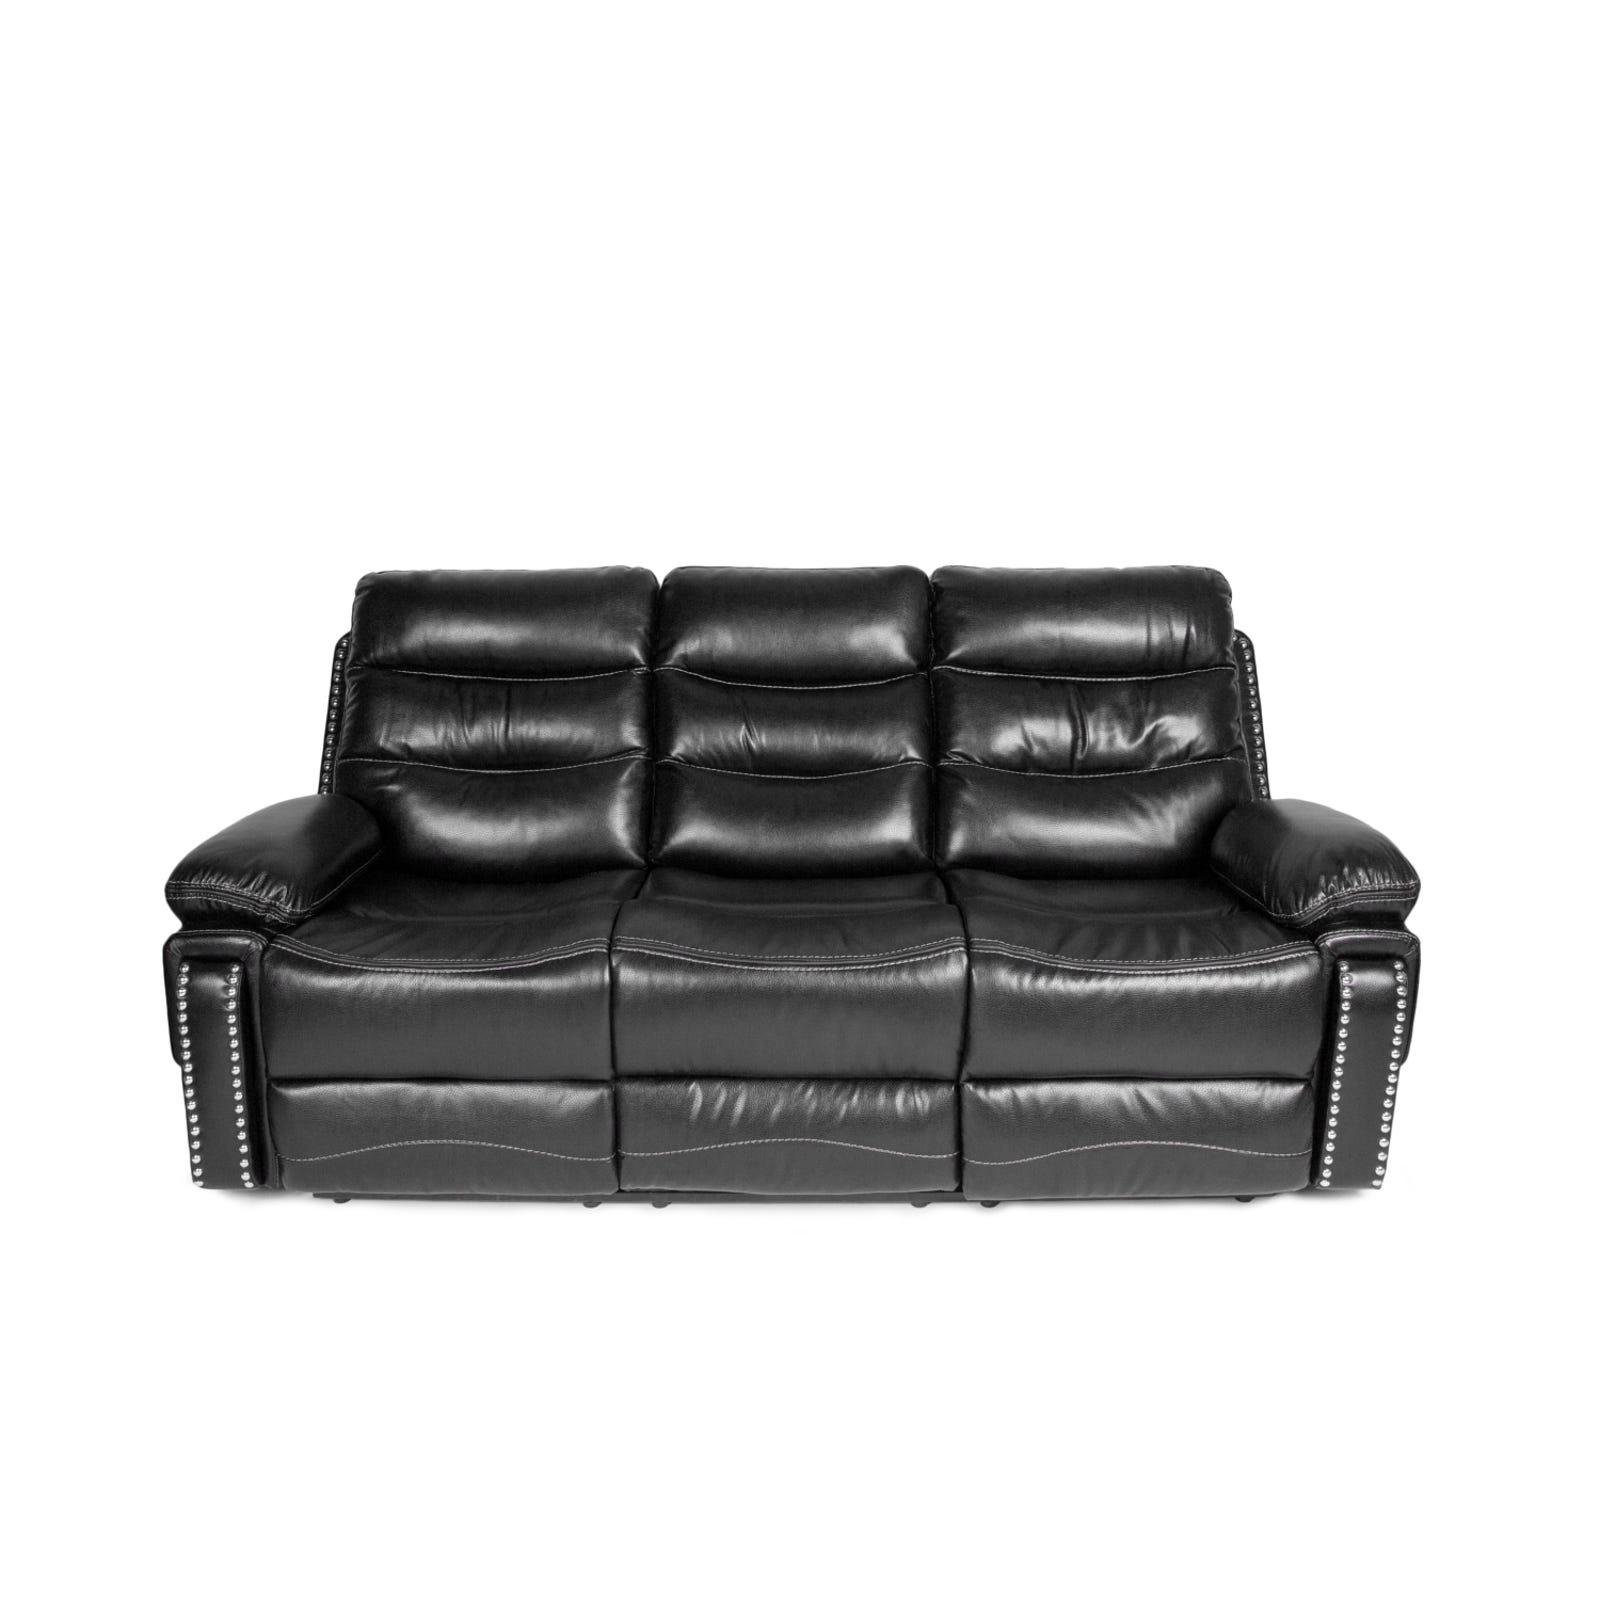 Pleasant Living Room Furniture Best Buy Canada Home Interior And Landscaping Dextoversignezvosmurscom